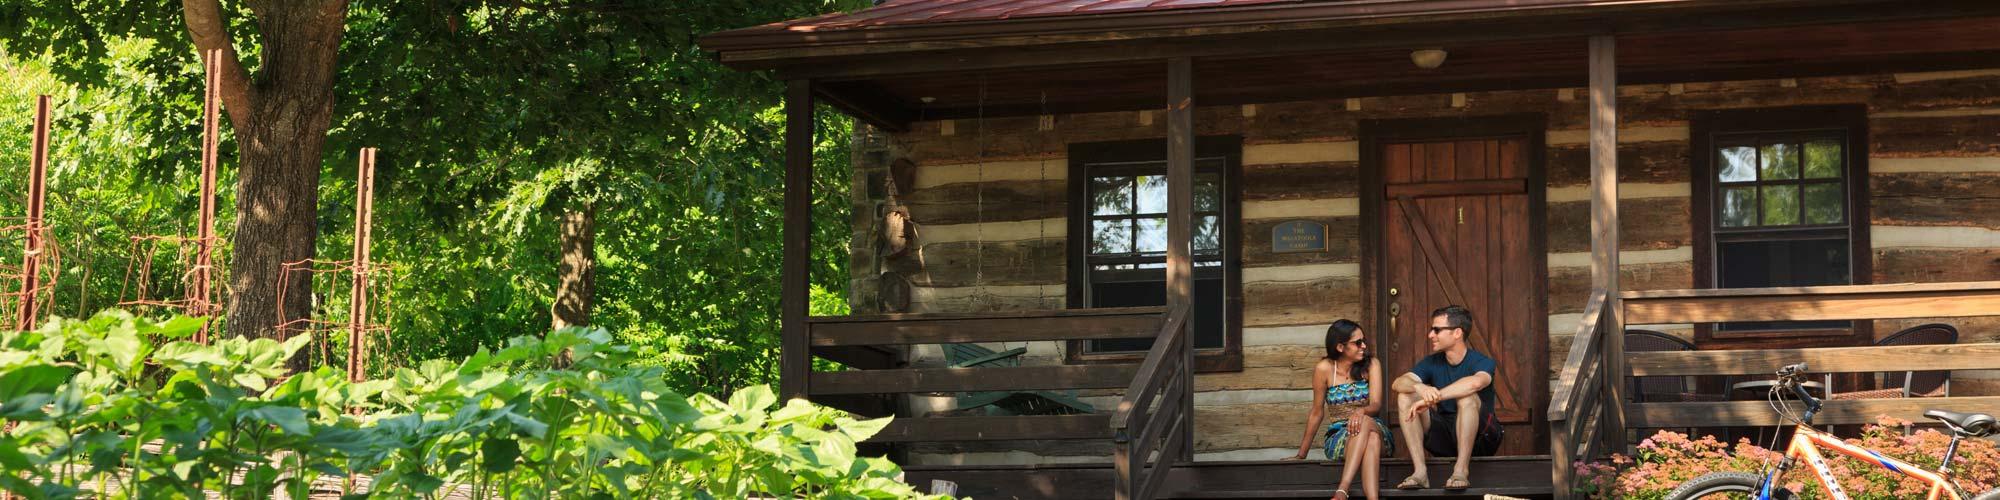 Fort Lewis Lodge| Bath County Virginia Inn, Bu0026B, Cabins And Restaurant |  Lodging In Hot Springs, Warm Springs, Blue Ridge Mountains